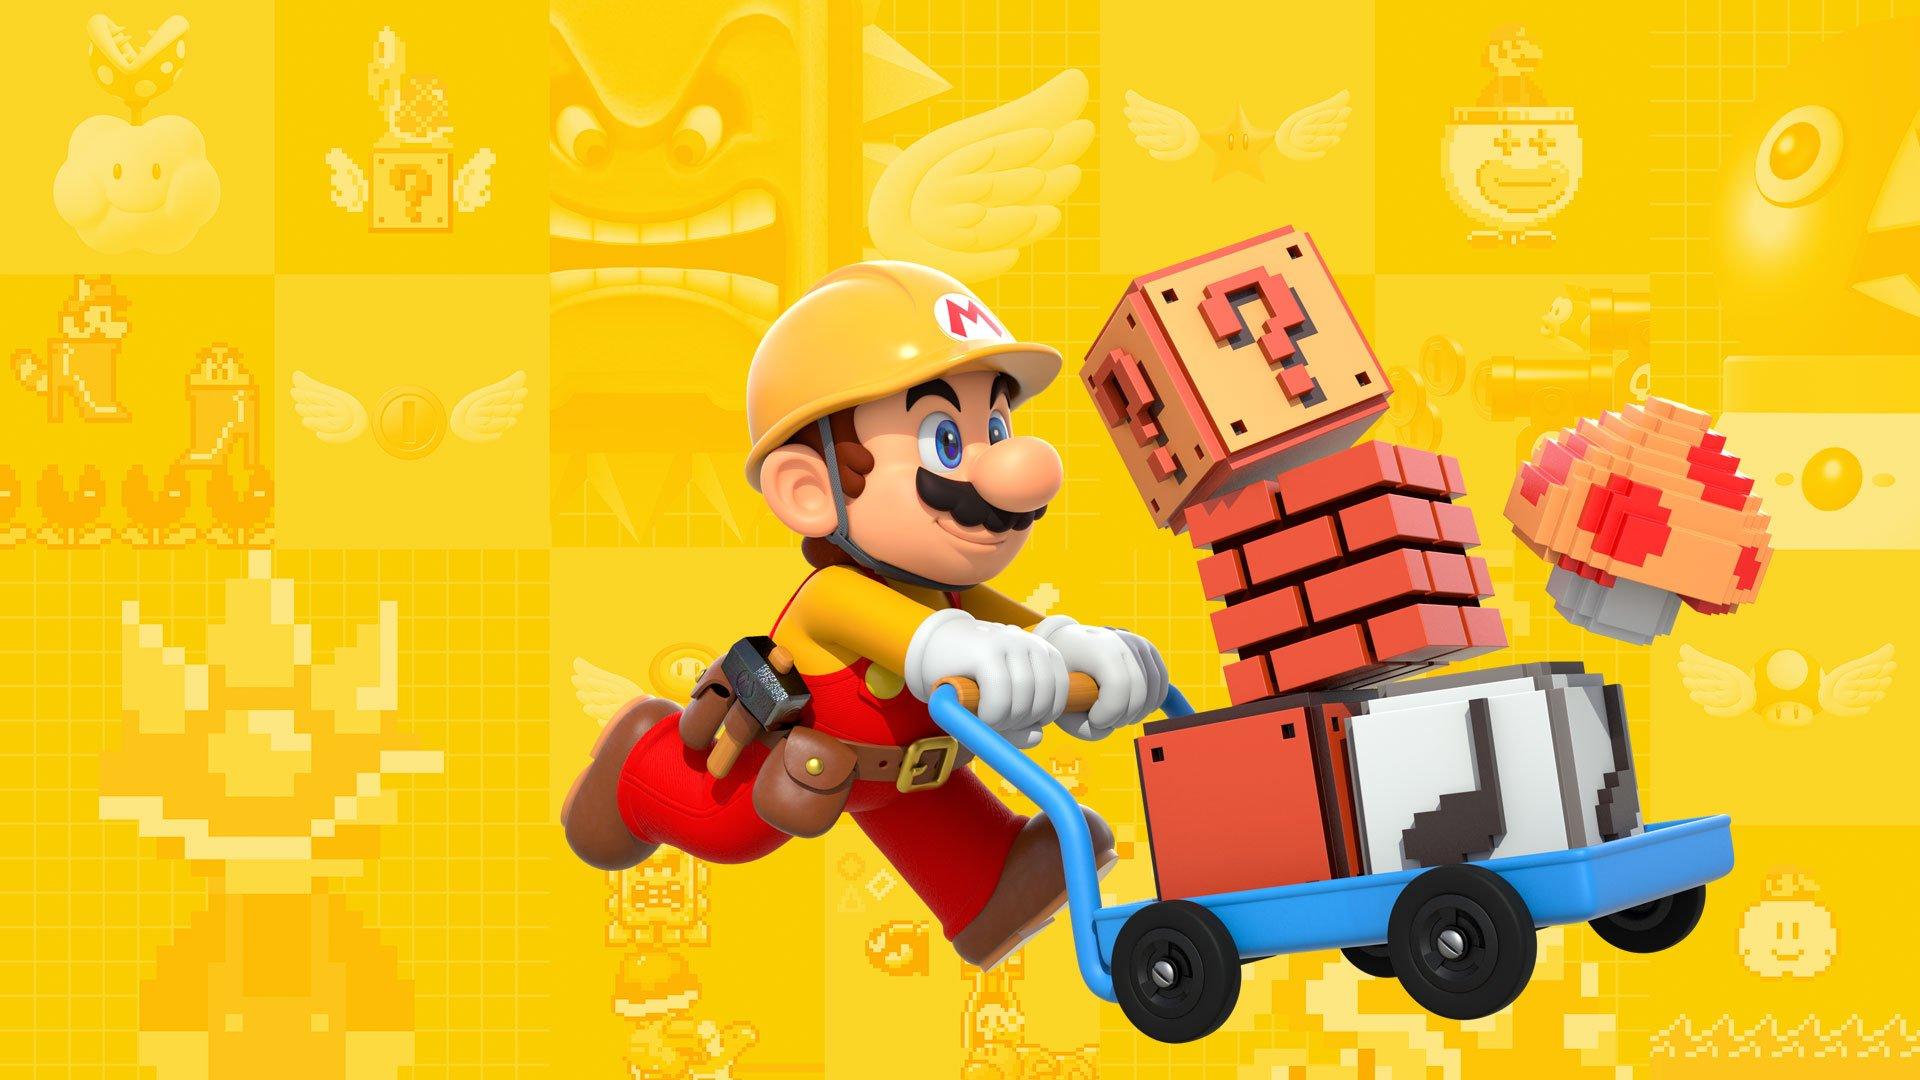 Mario_maker_Rev_Portada.jpg